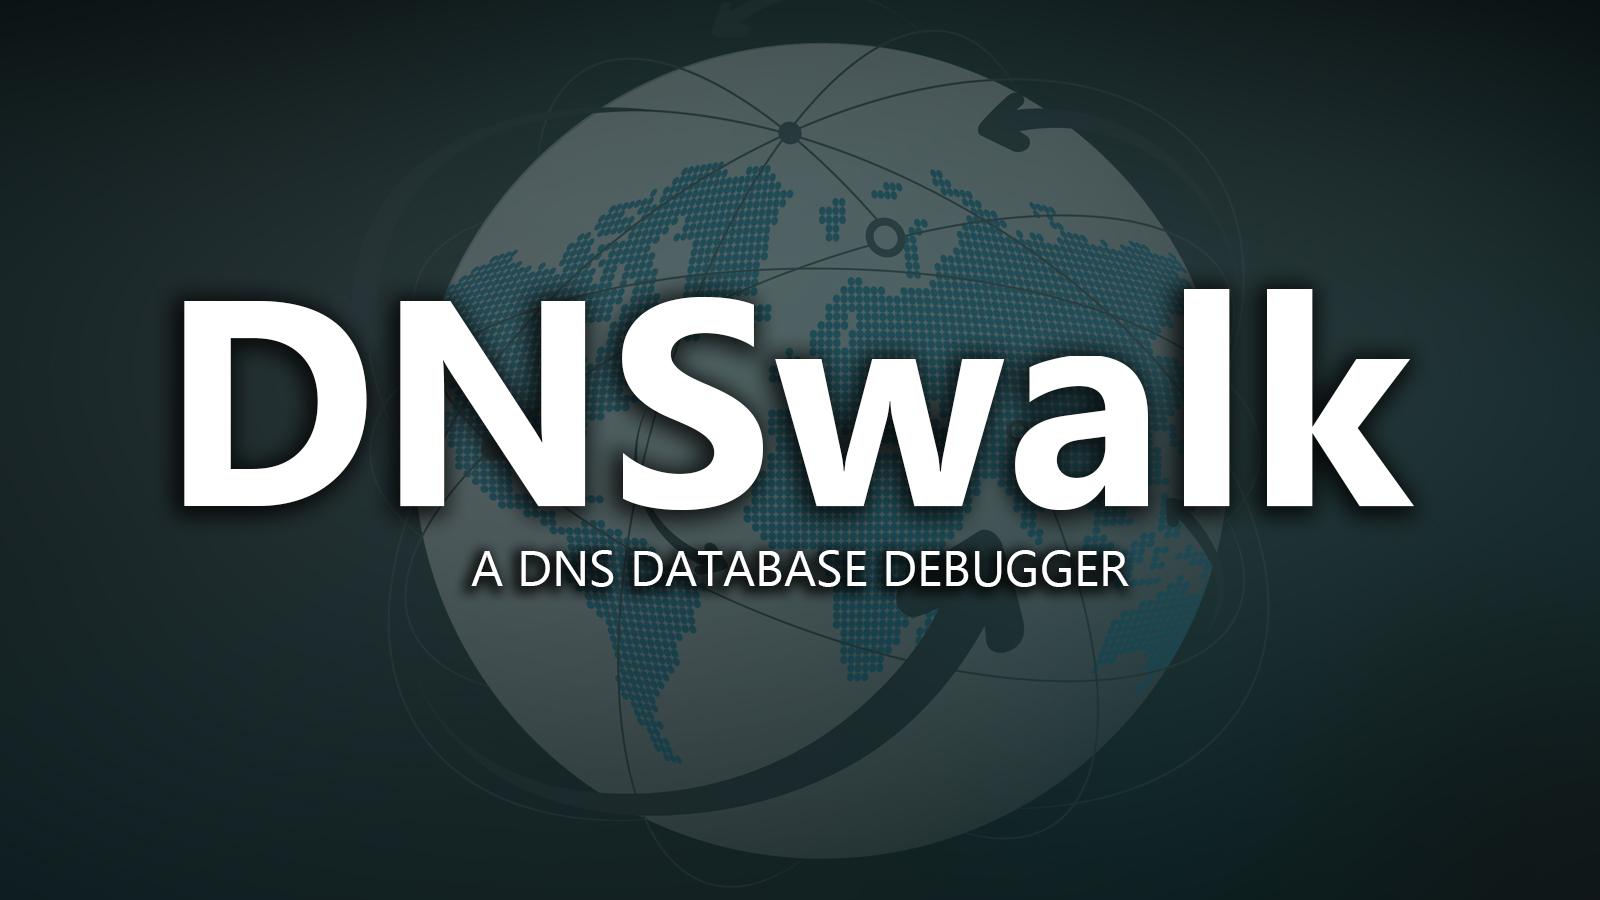 DNSwalk